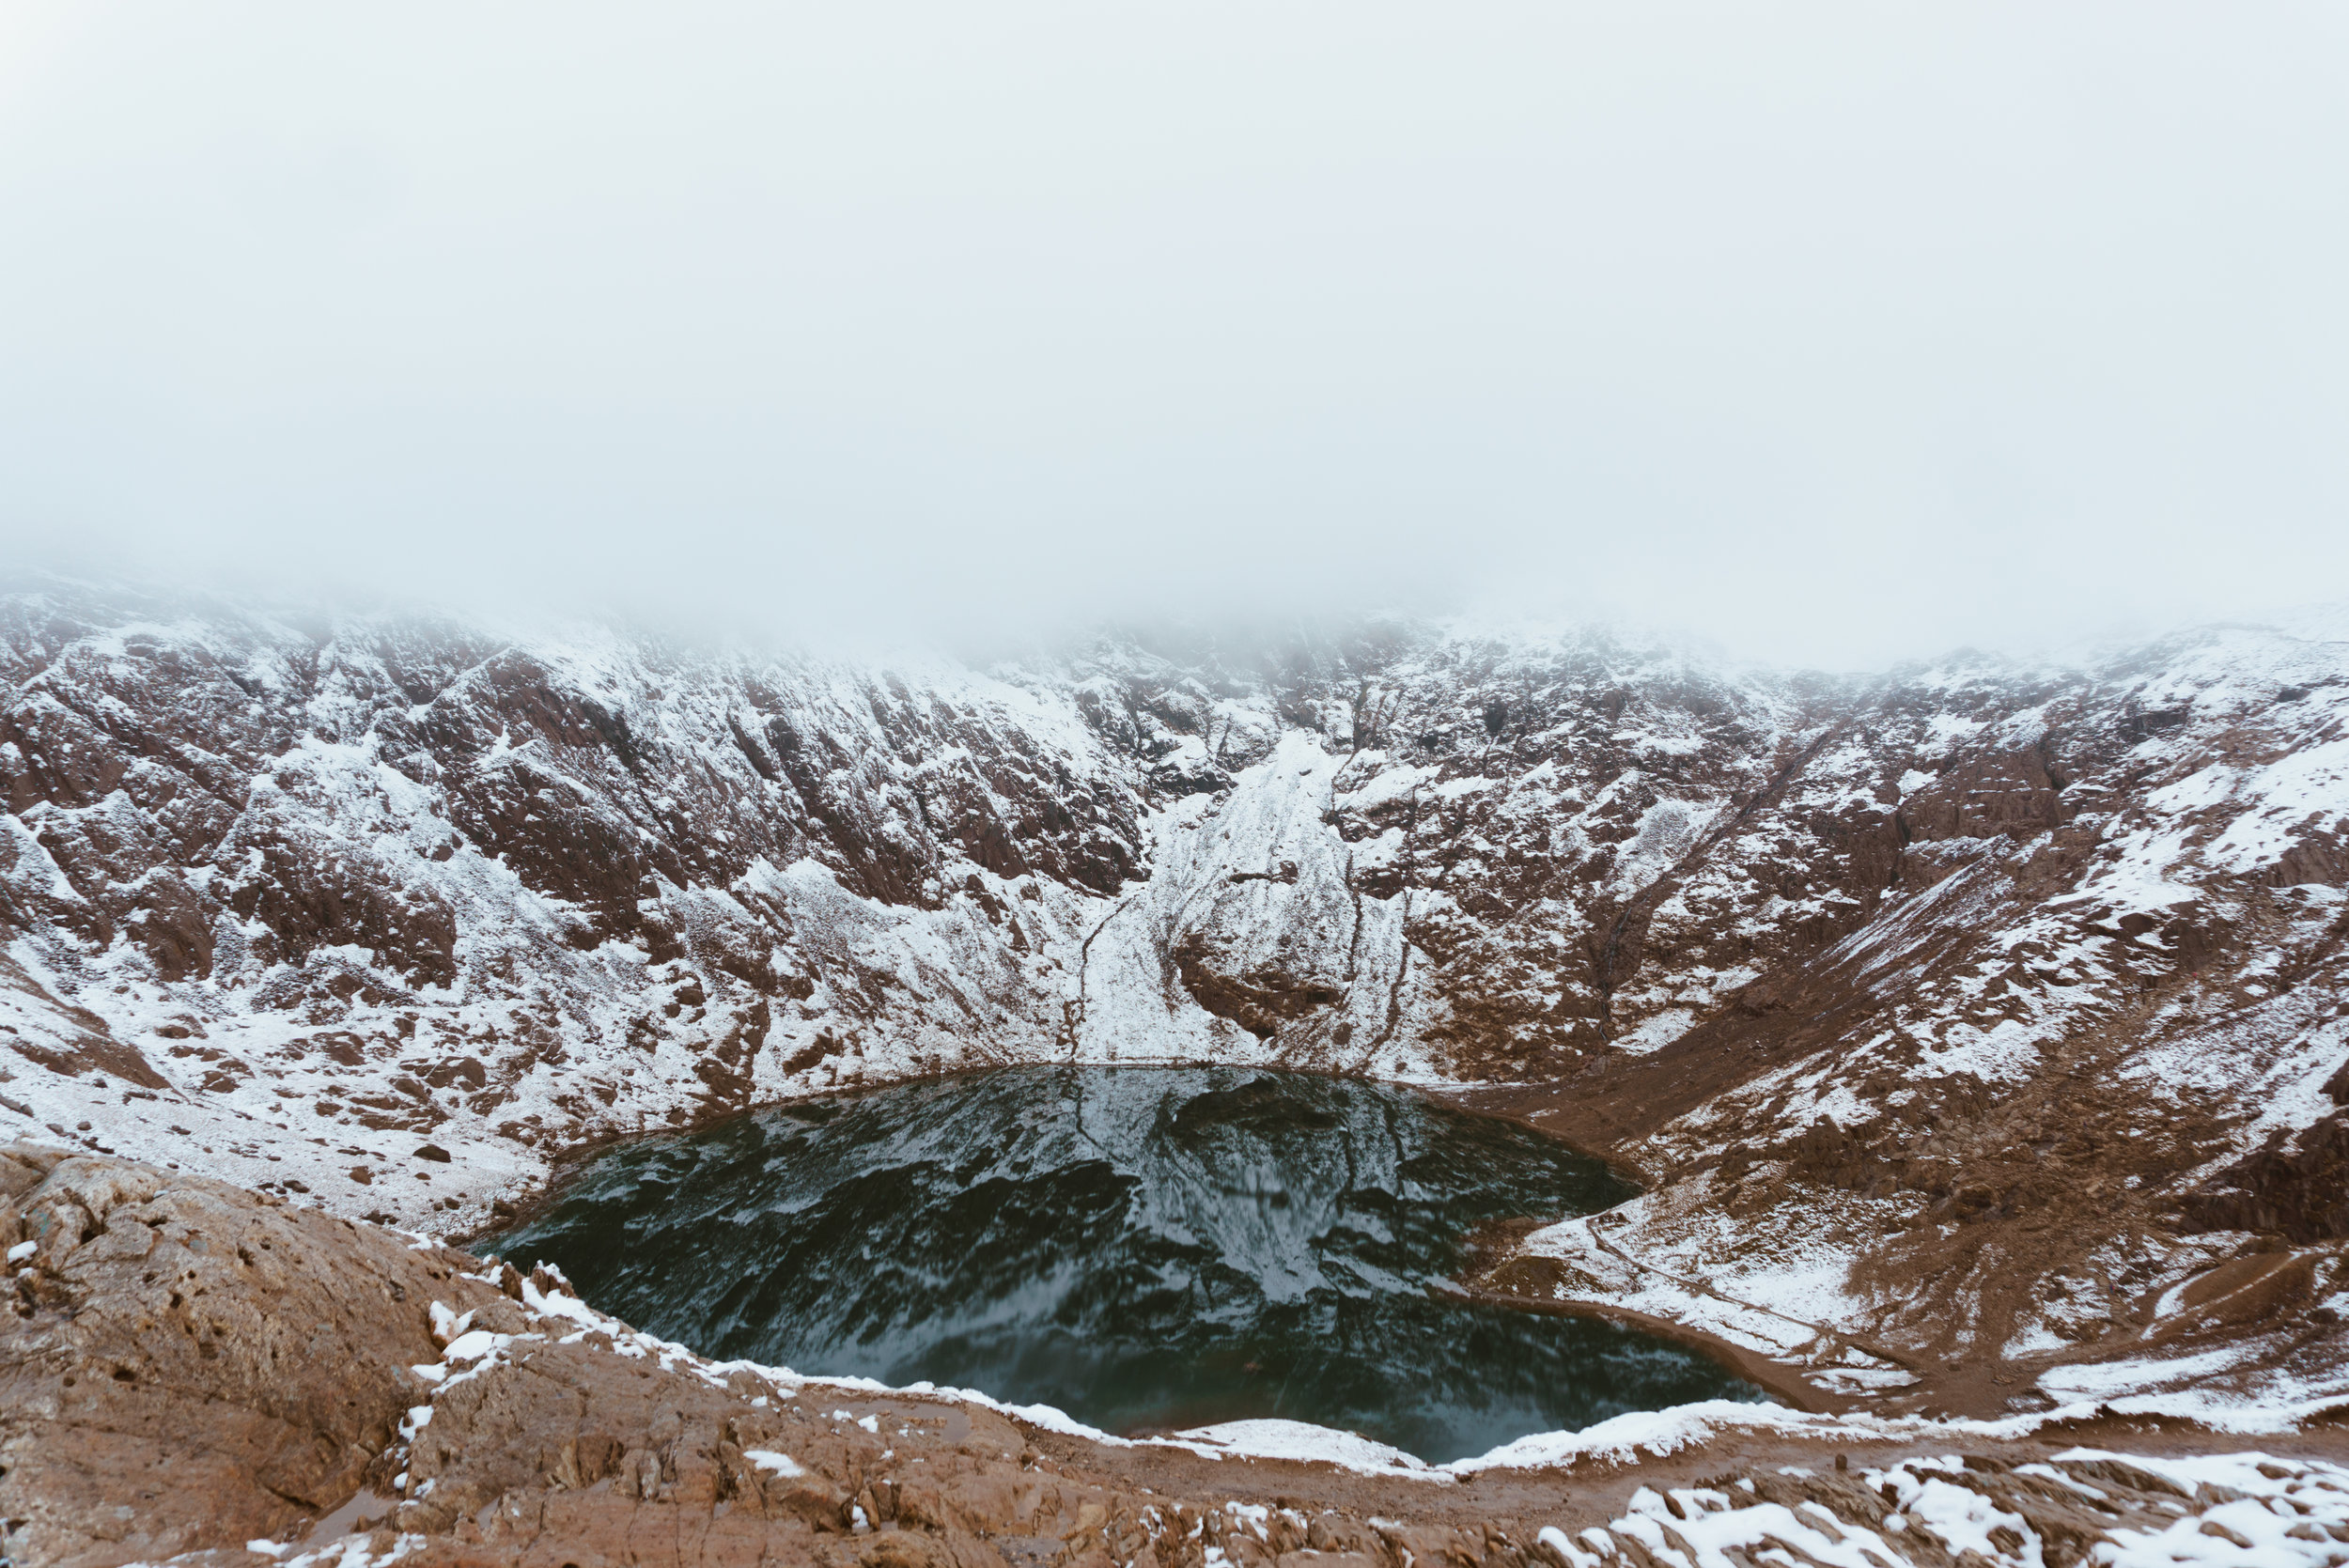 Snowdonia – April 2018